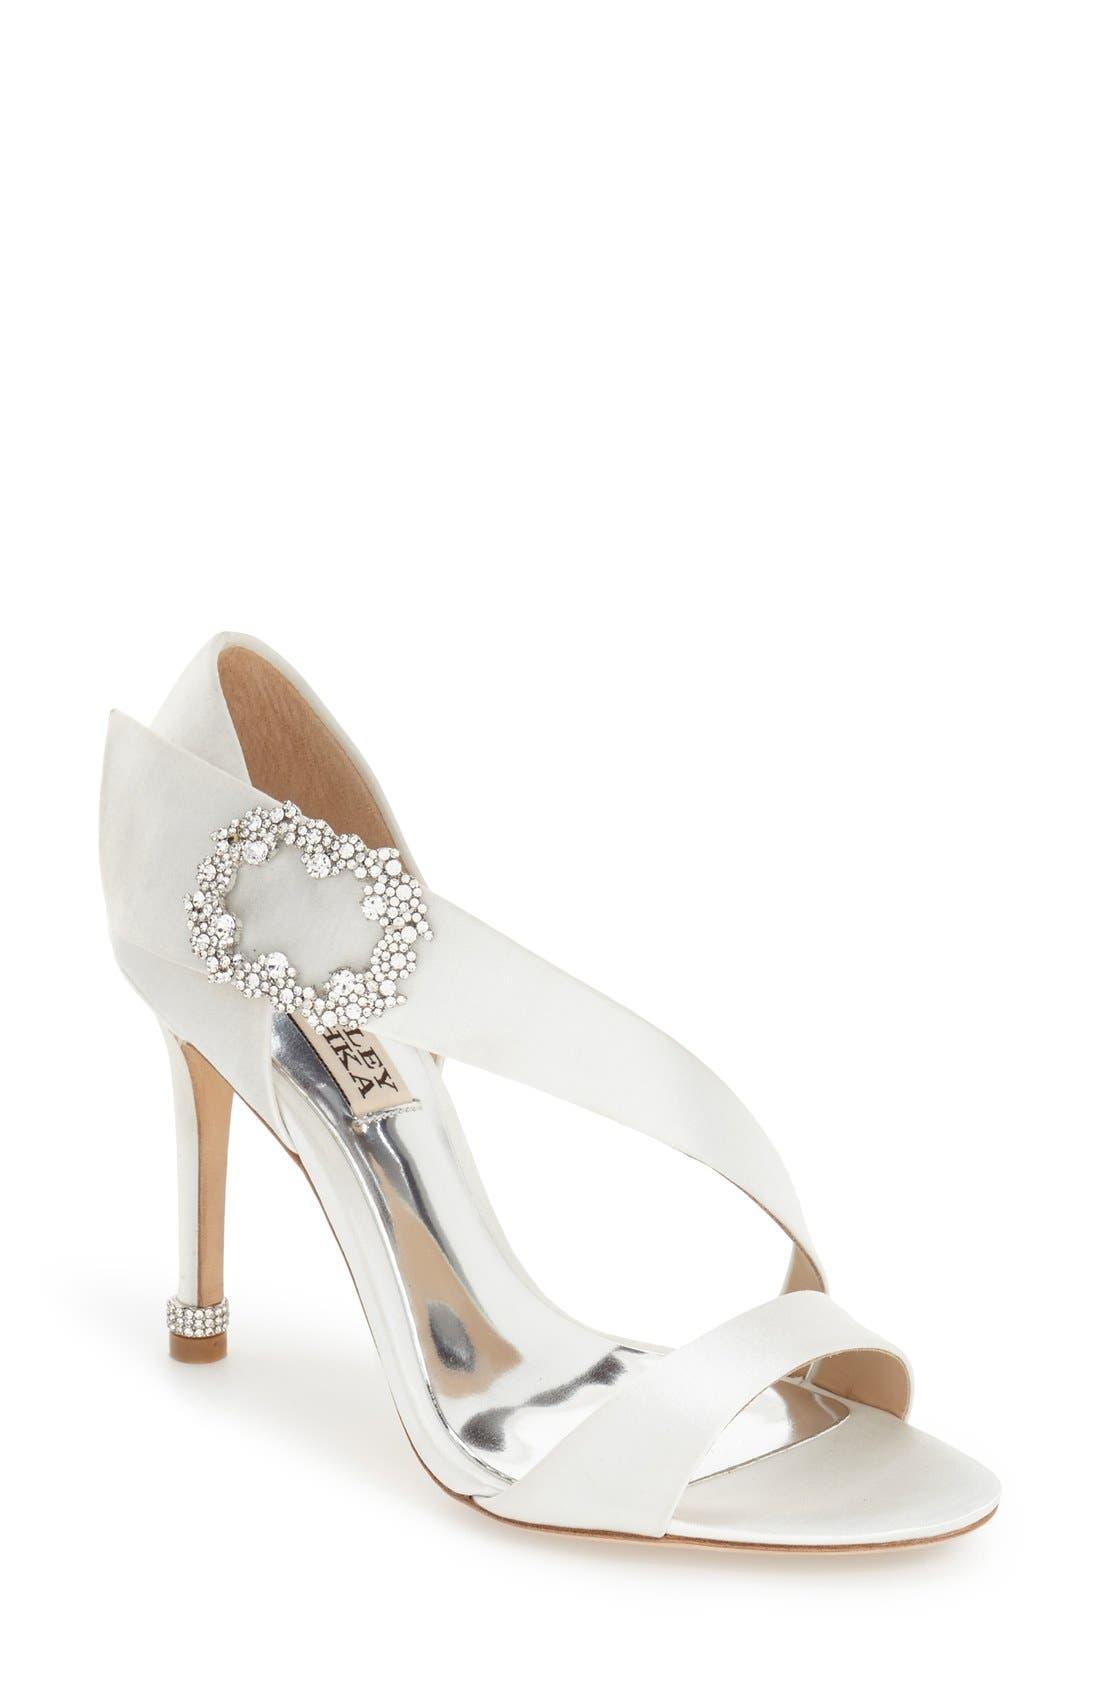 Main Image - Badgley Mischka 'Night' Crystal Embellished Evening Sandal (Women)